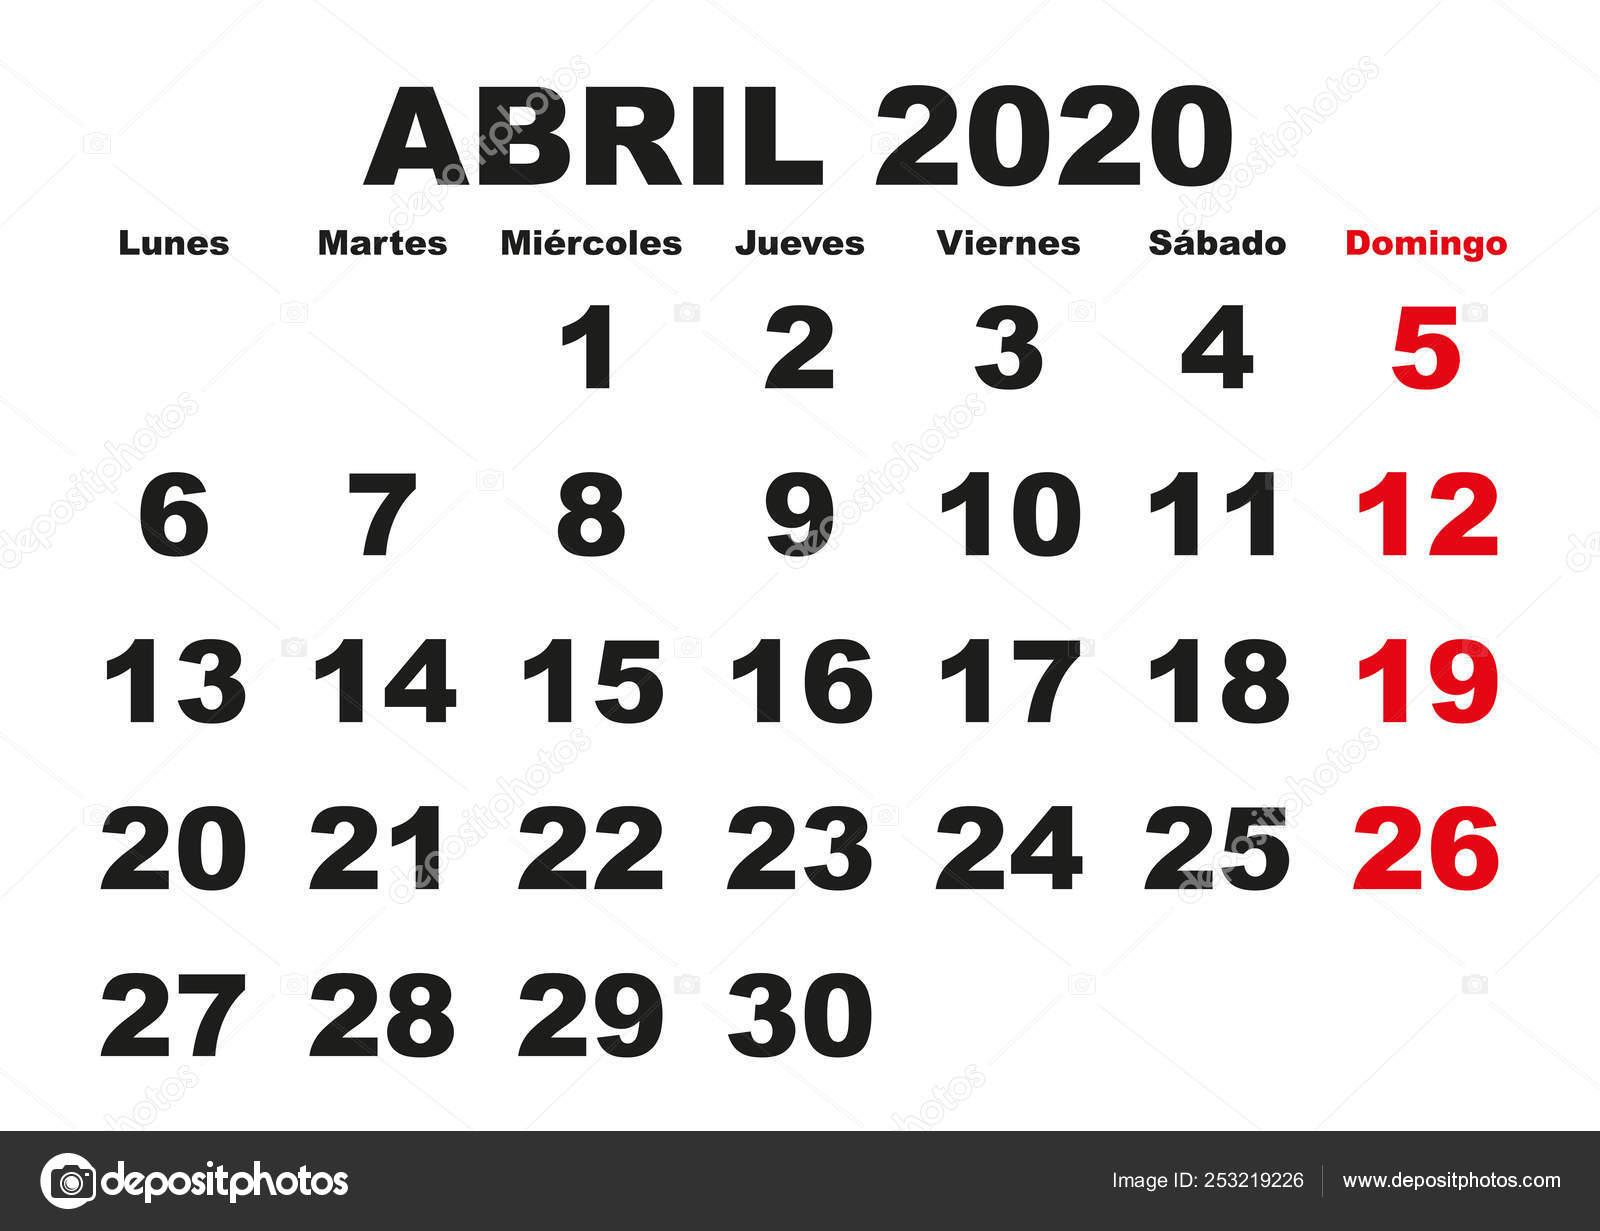 Calendario Mese Aprile 2020.Abril 2020 Parete Calendario Spagnolo Vettoriali Stock